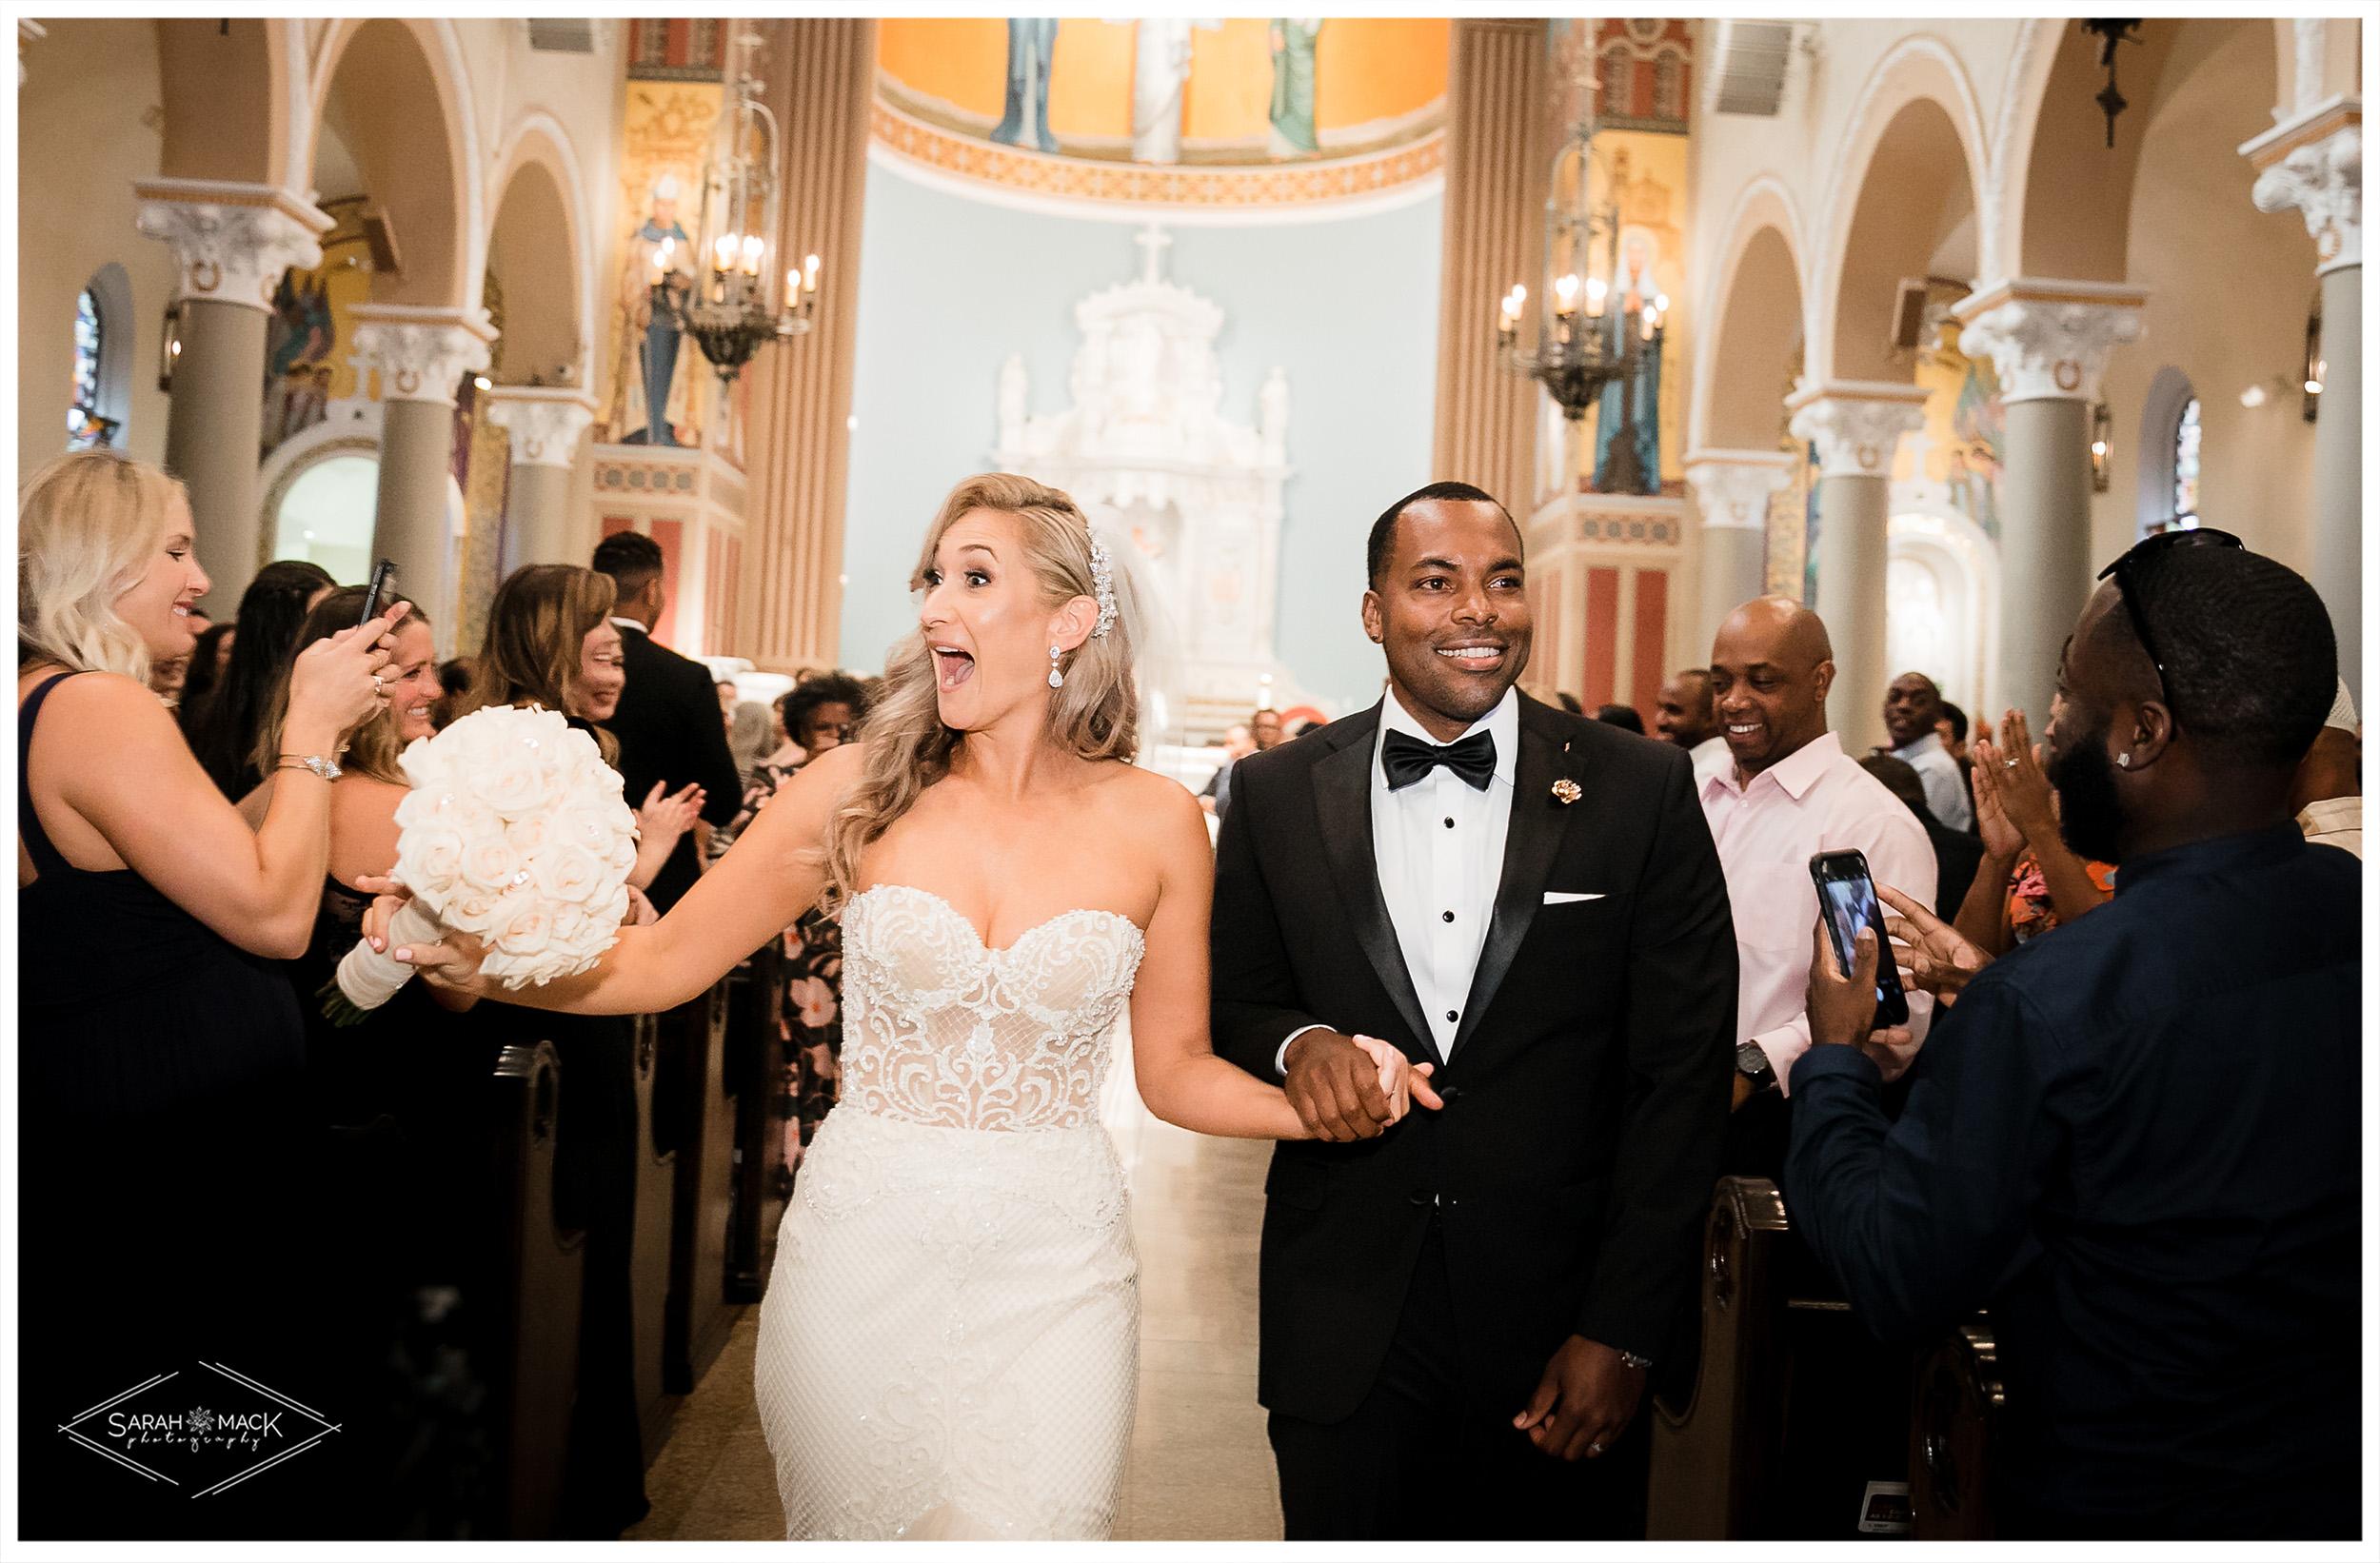 MK-Santa-Monica-Catholic-Church-Wedding-Photography-32.jpg